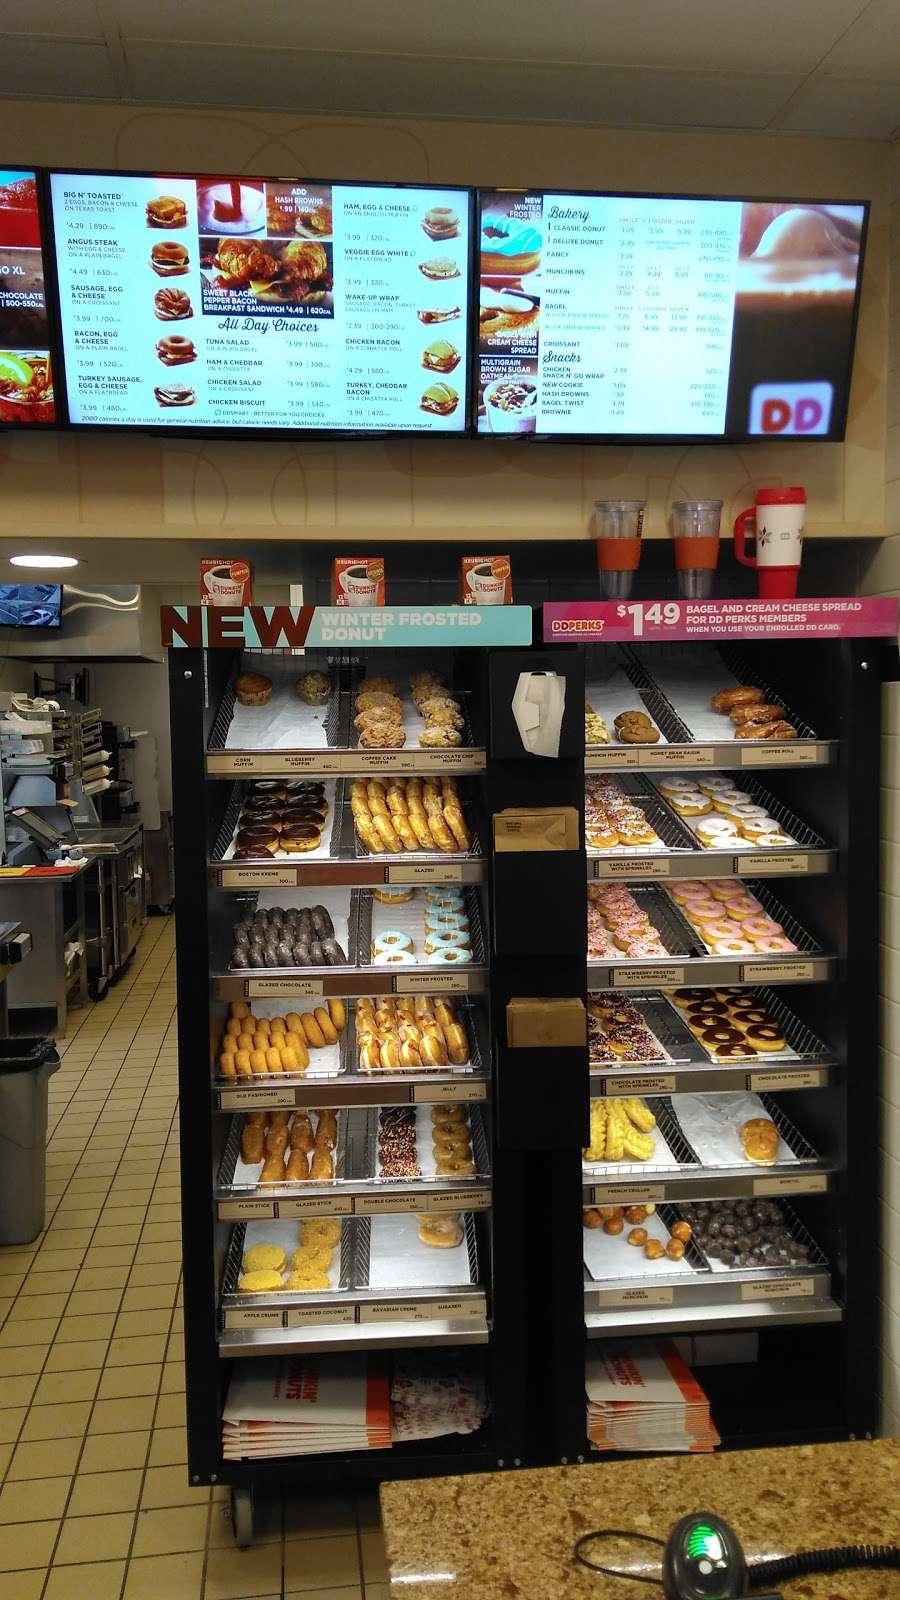 Dunkin Donuts - cafe  | Photo 4 of 10 | Address: 454 Spring St, Elizabeth, NJ 07201, USA | Phone: (973) 298-3285